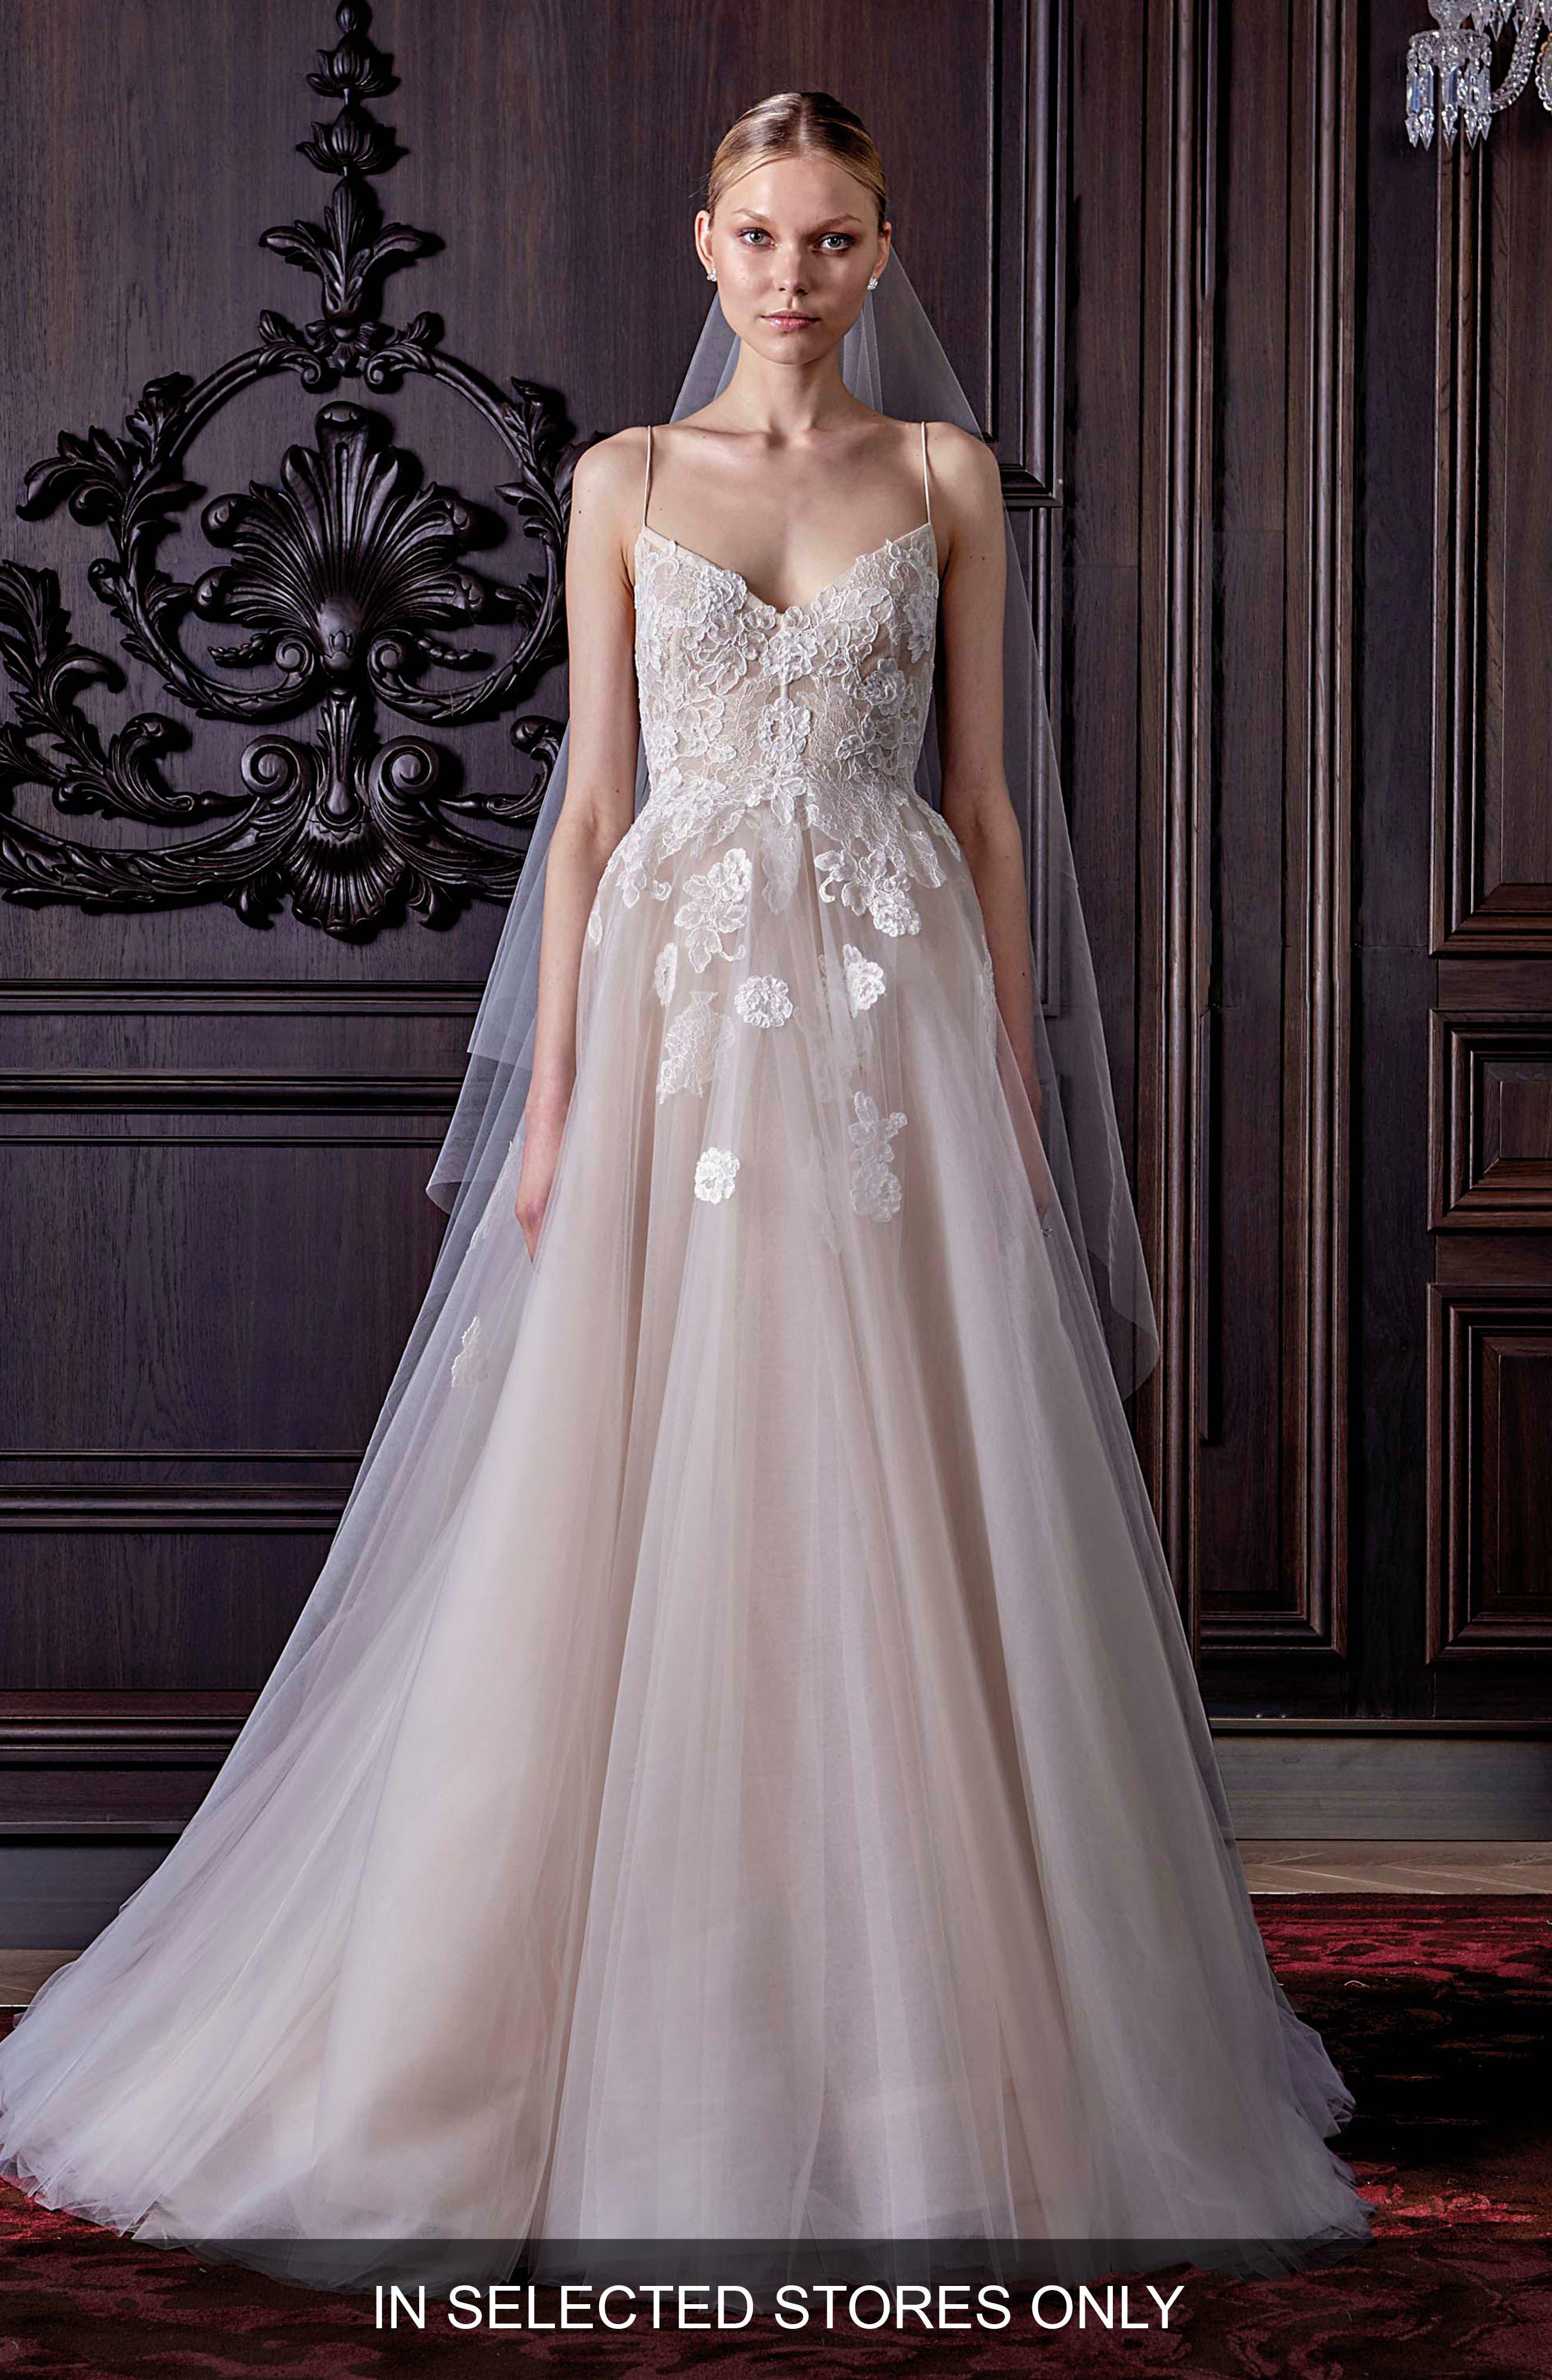 women s lhuillier wedding dresses bridal gowns nordstrom